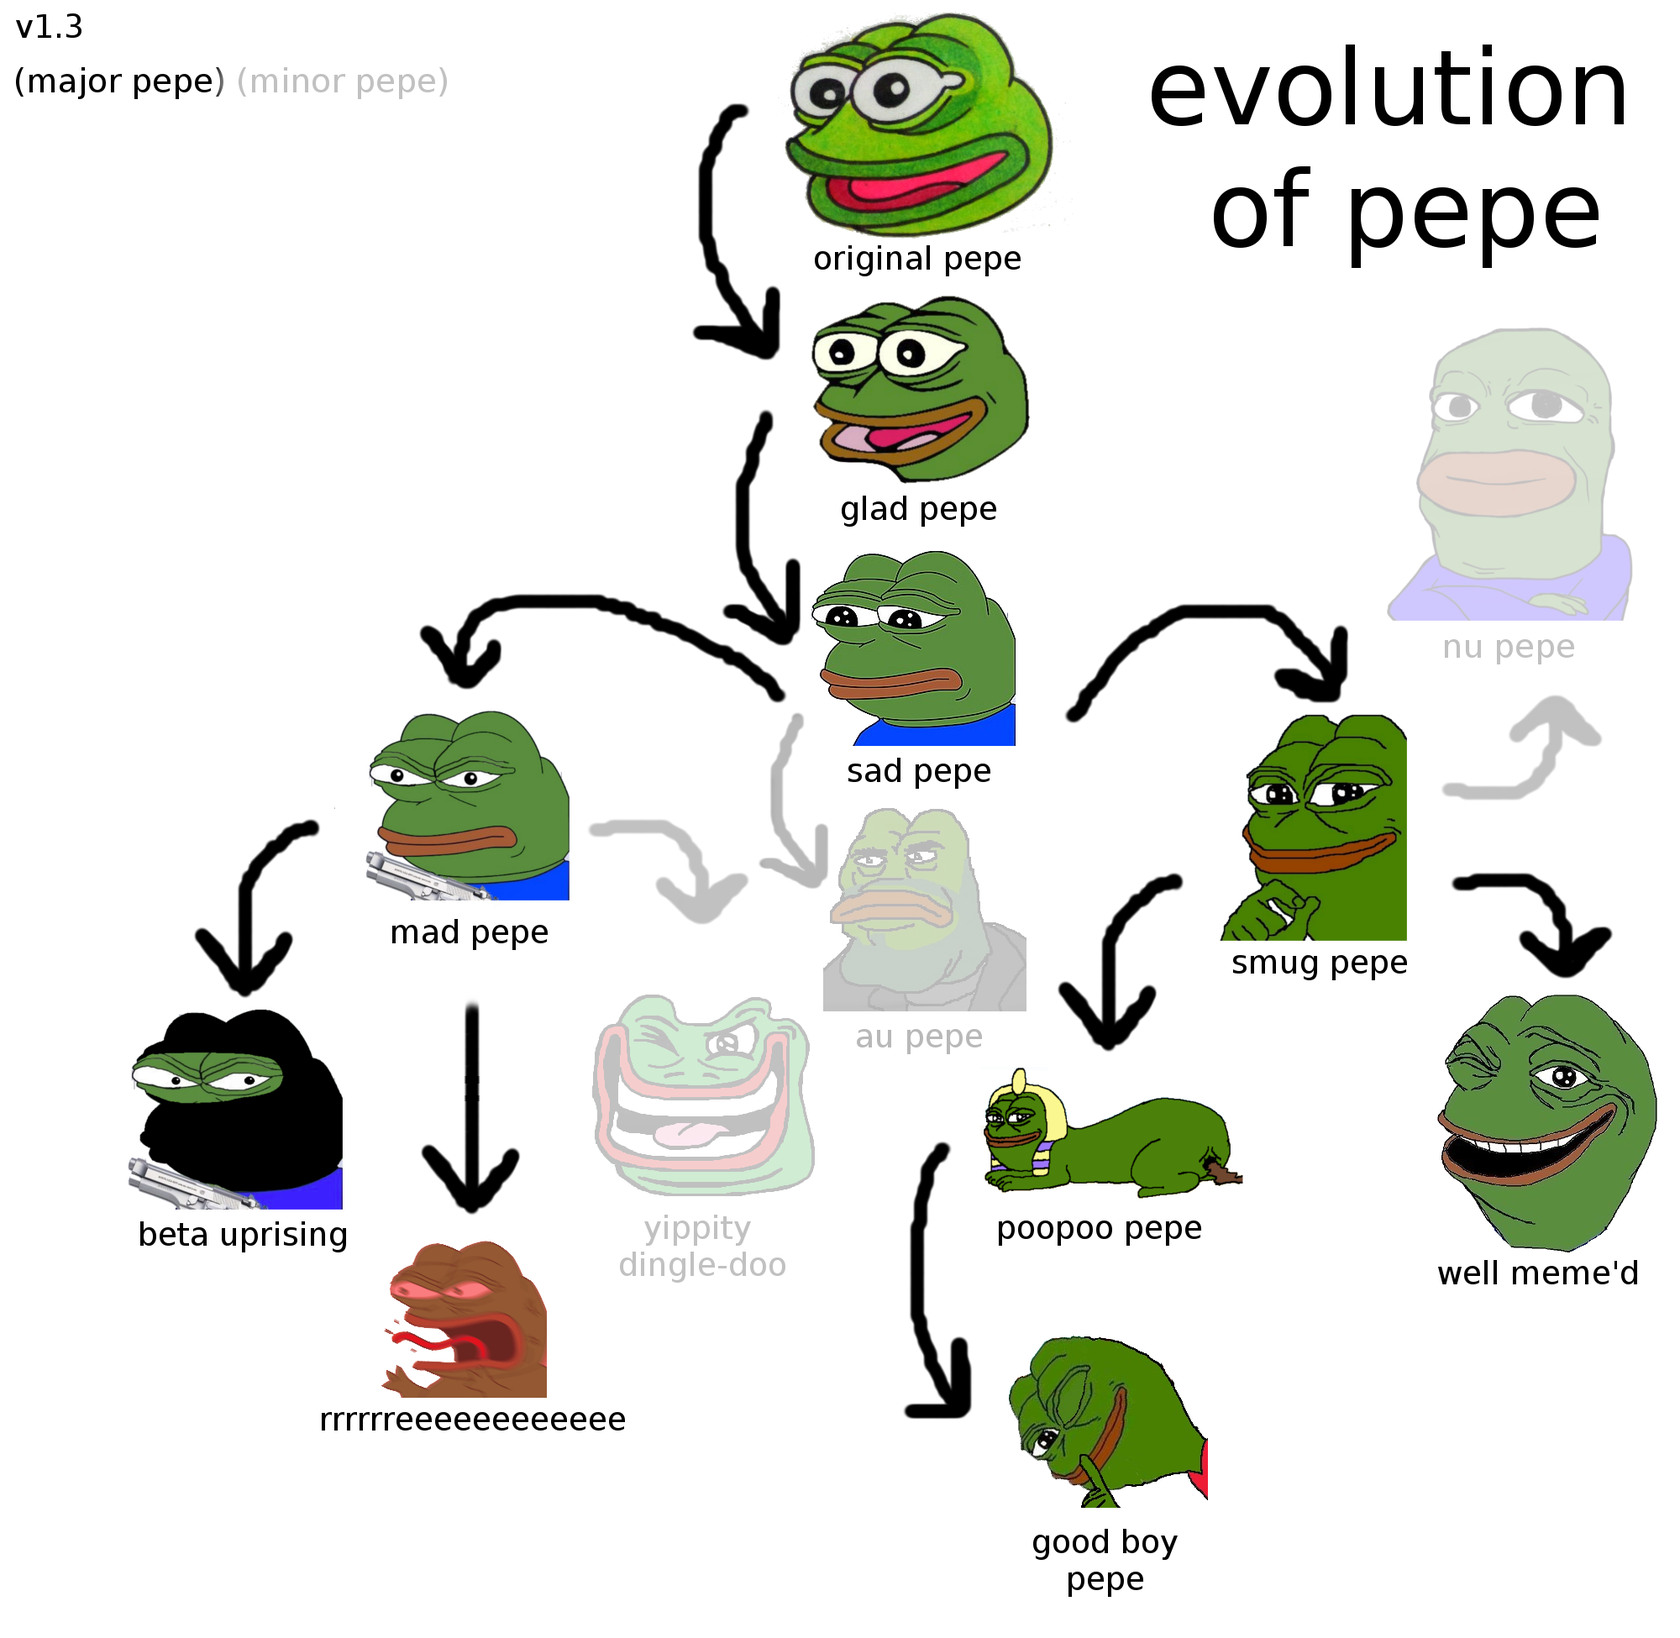 Evolucion de los pepes - meme